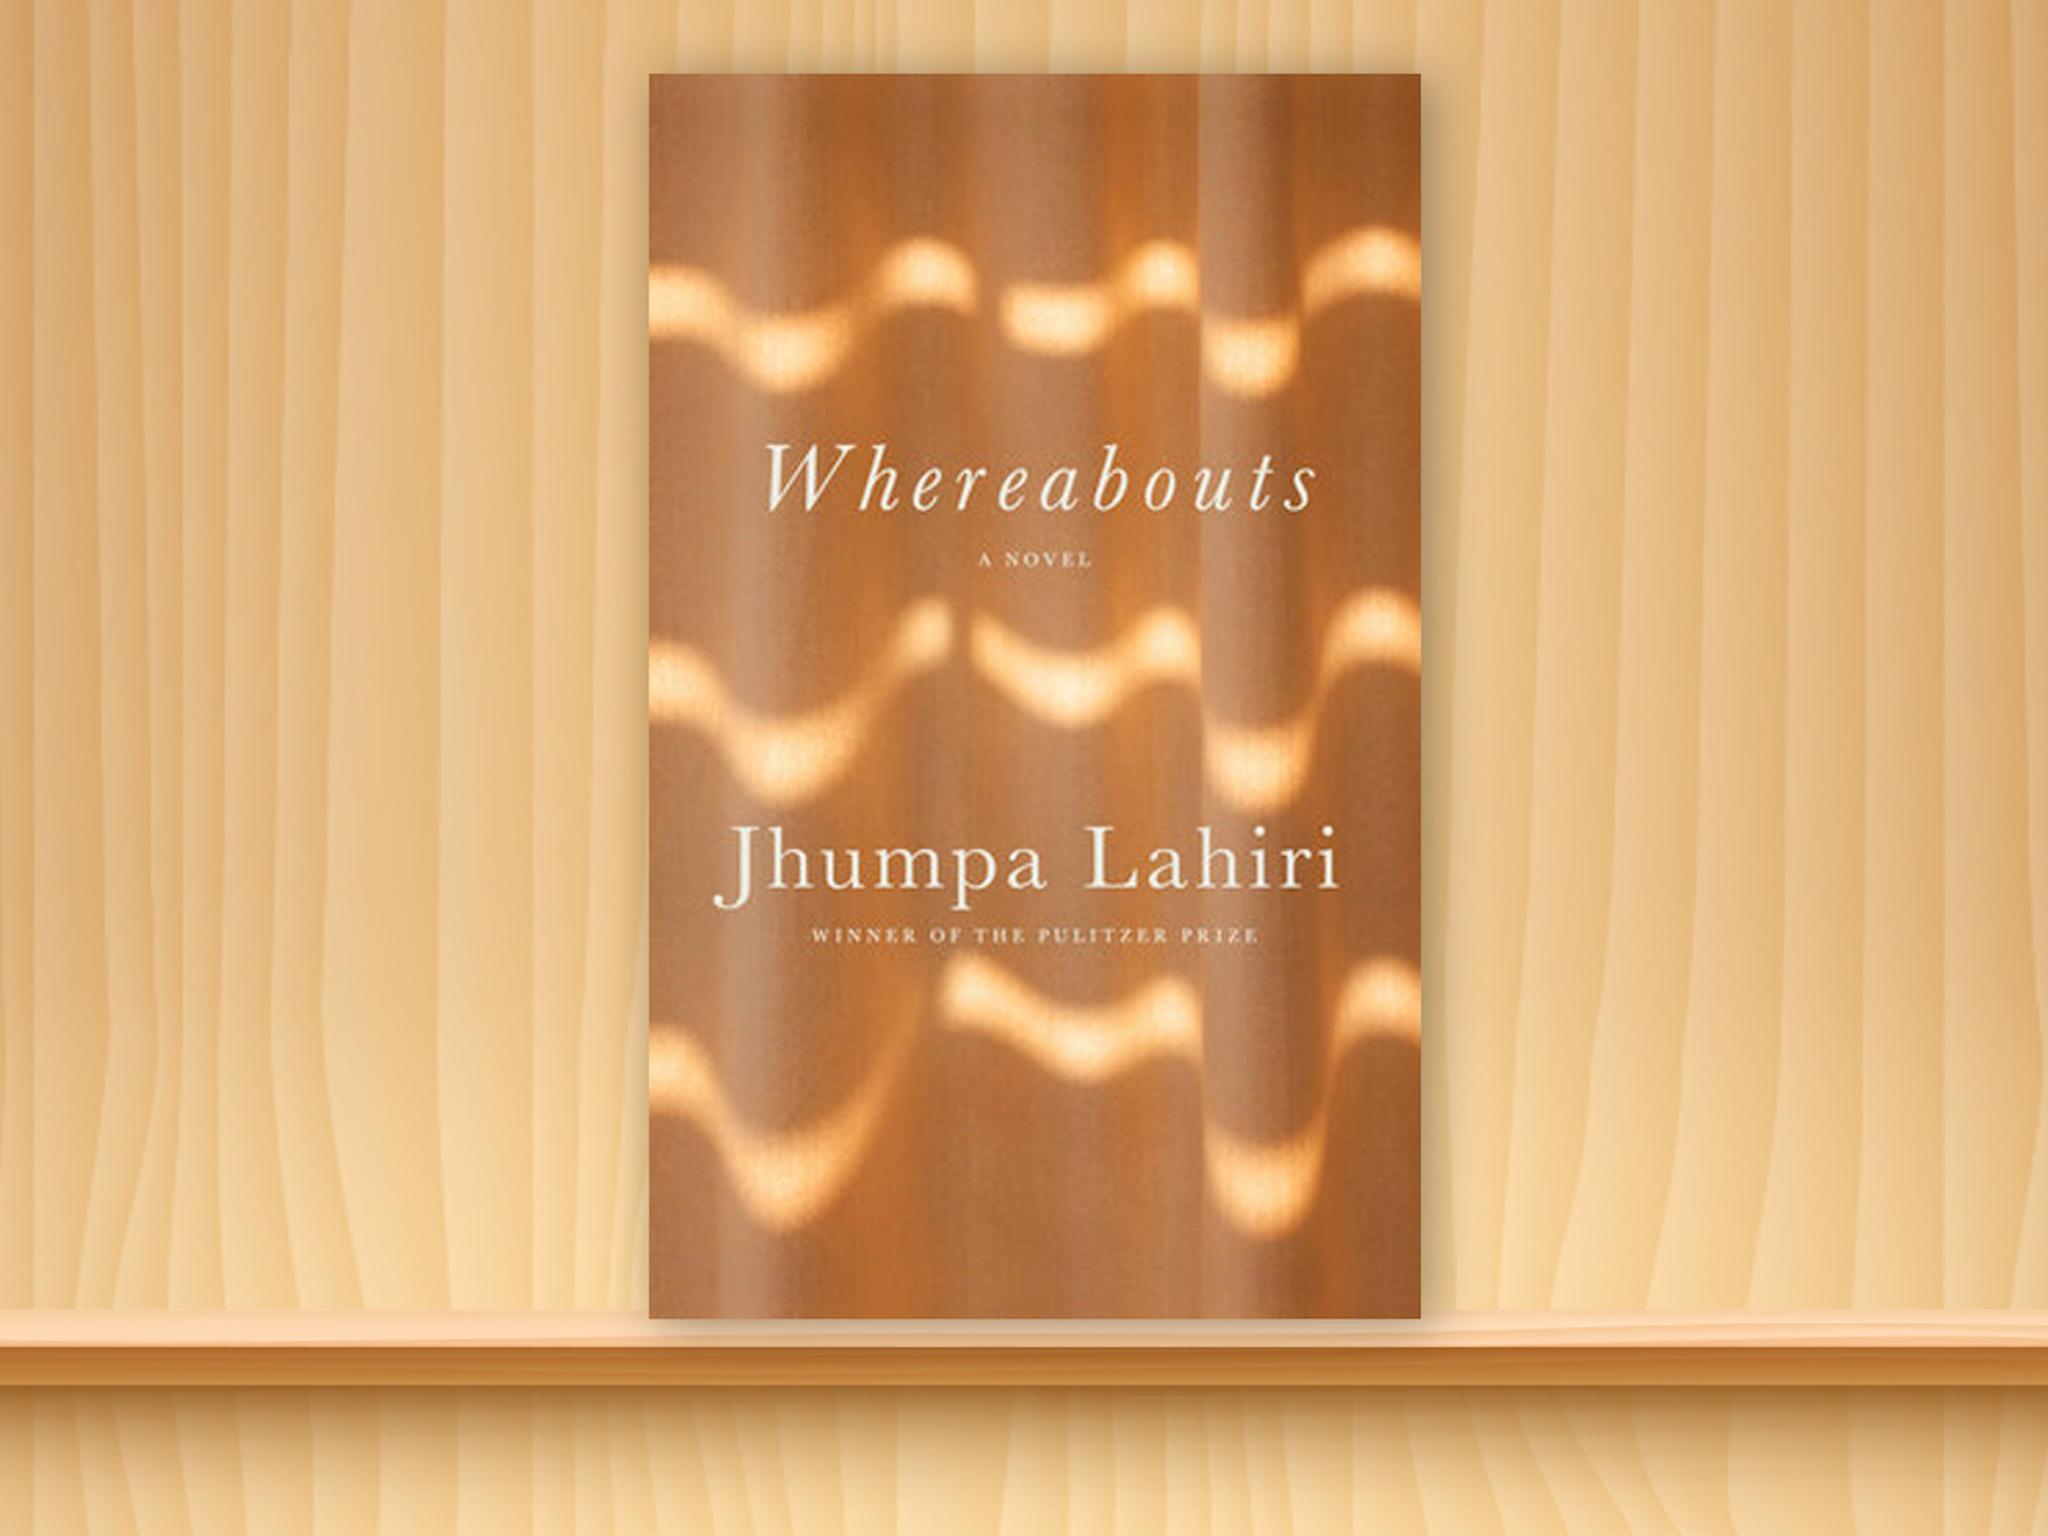 Whereabouts Jhumpa Lahiri